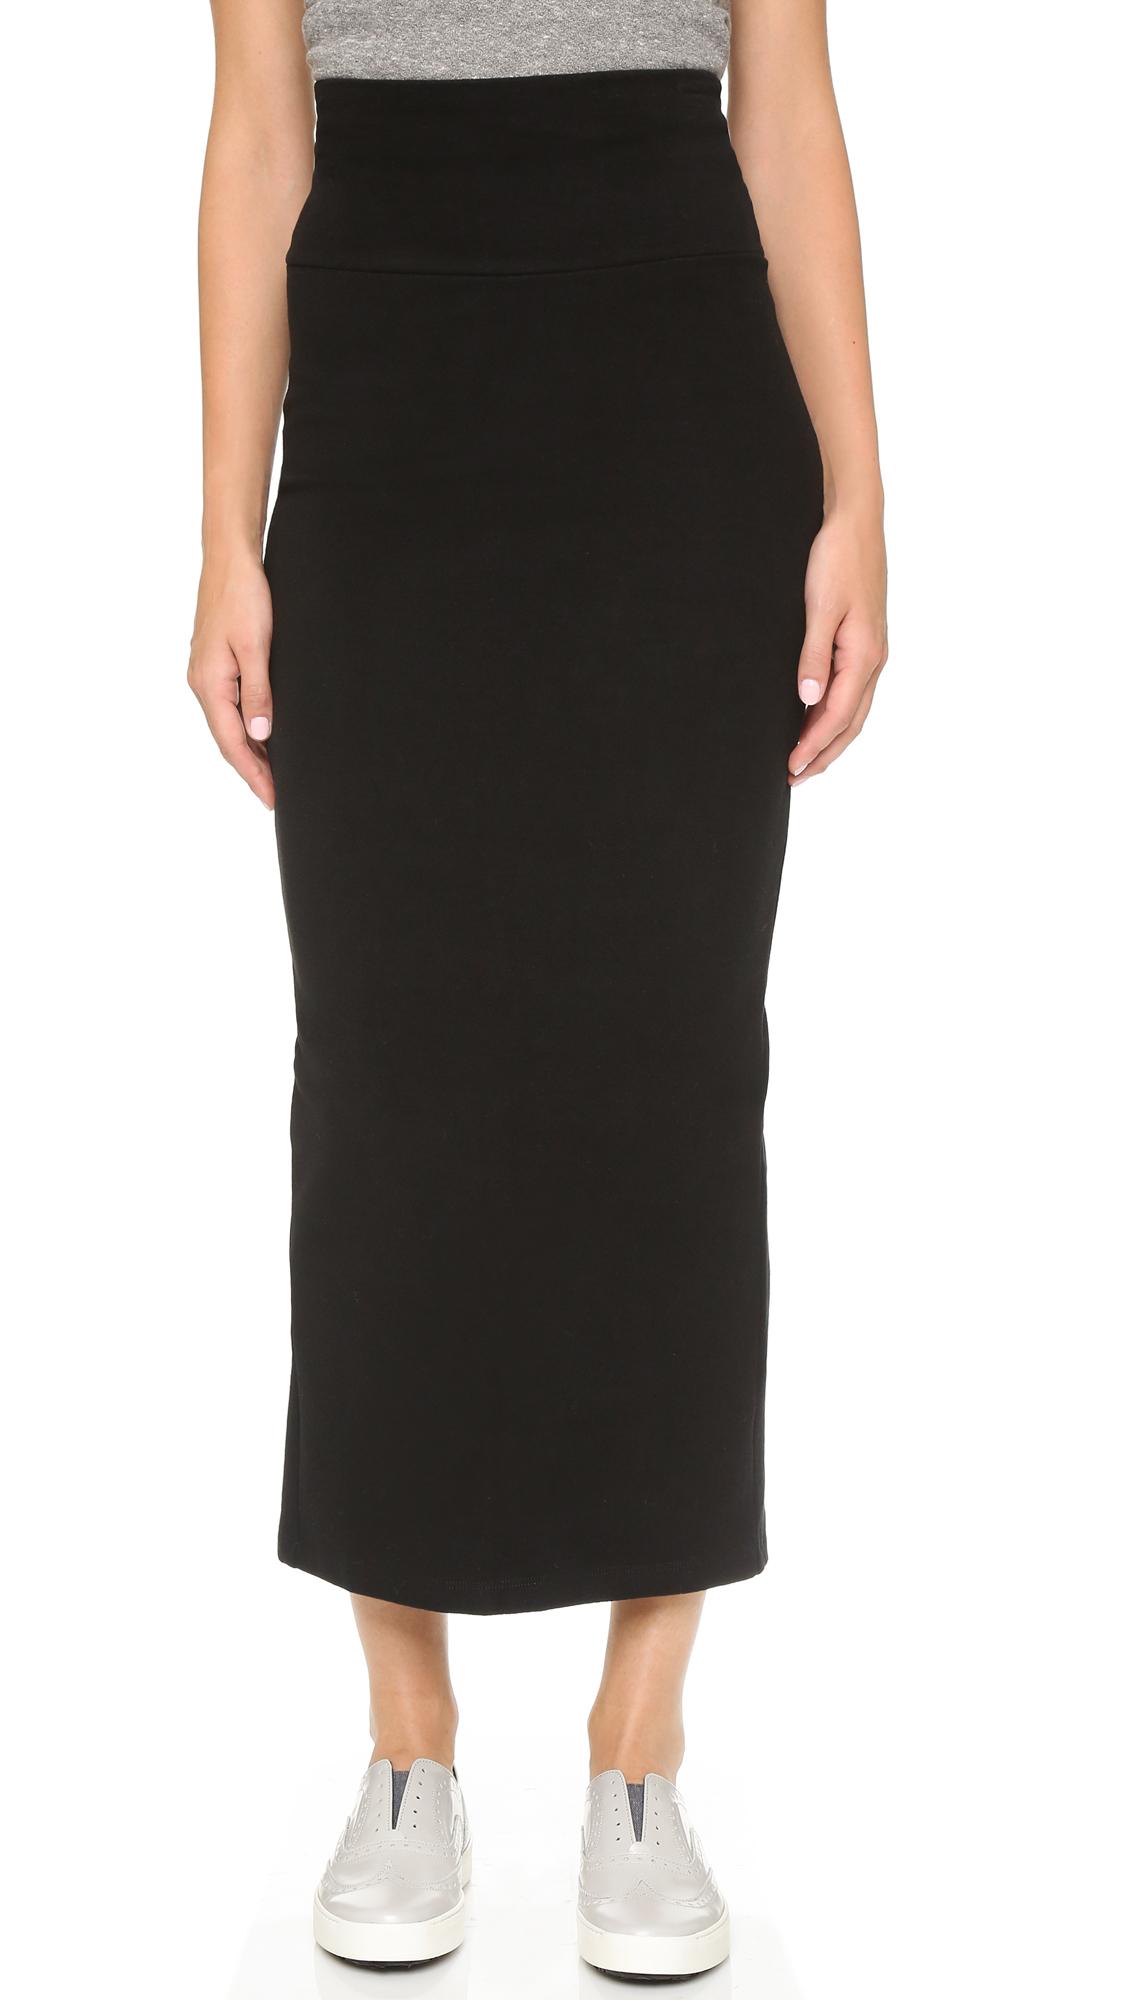 James perse Knit Moleskin Pencil Skirt - Black in Black | Lyst